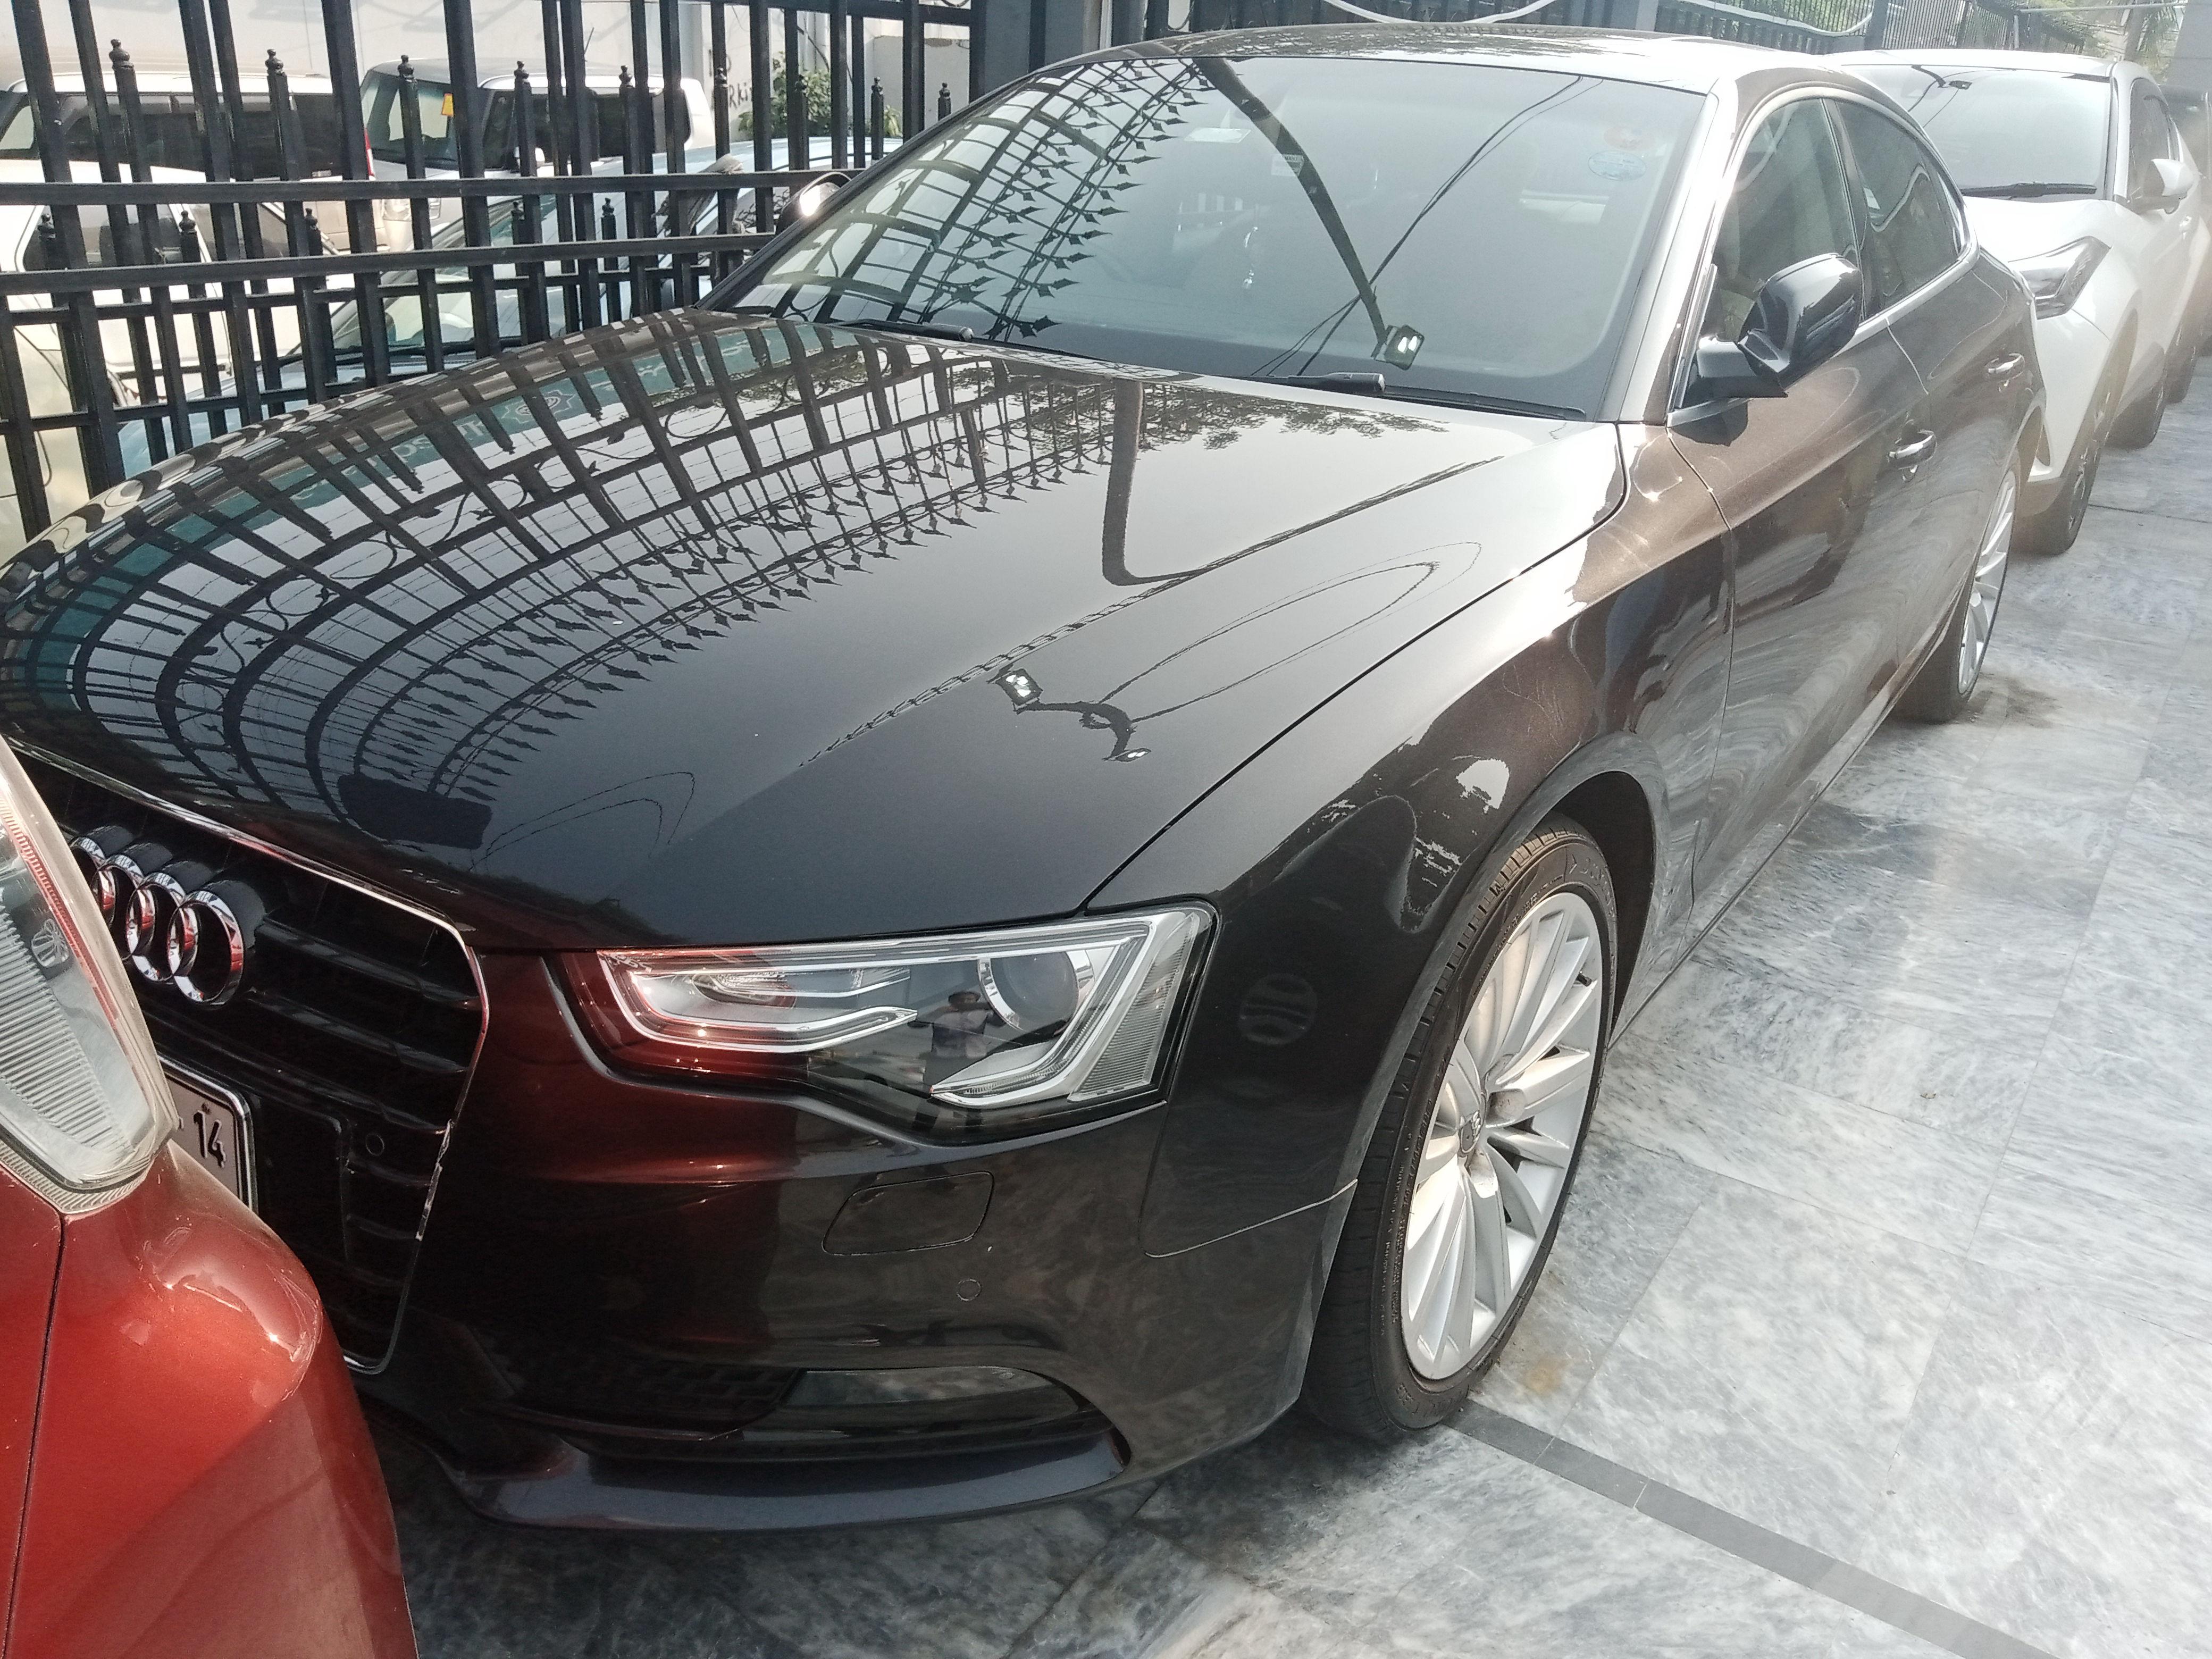 Audi A5 S-Line Competitio 2014